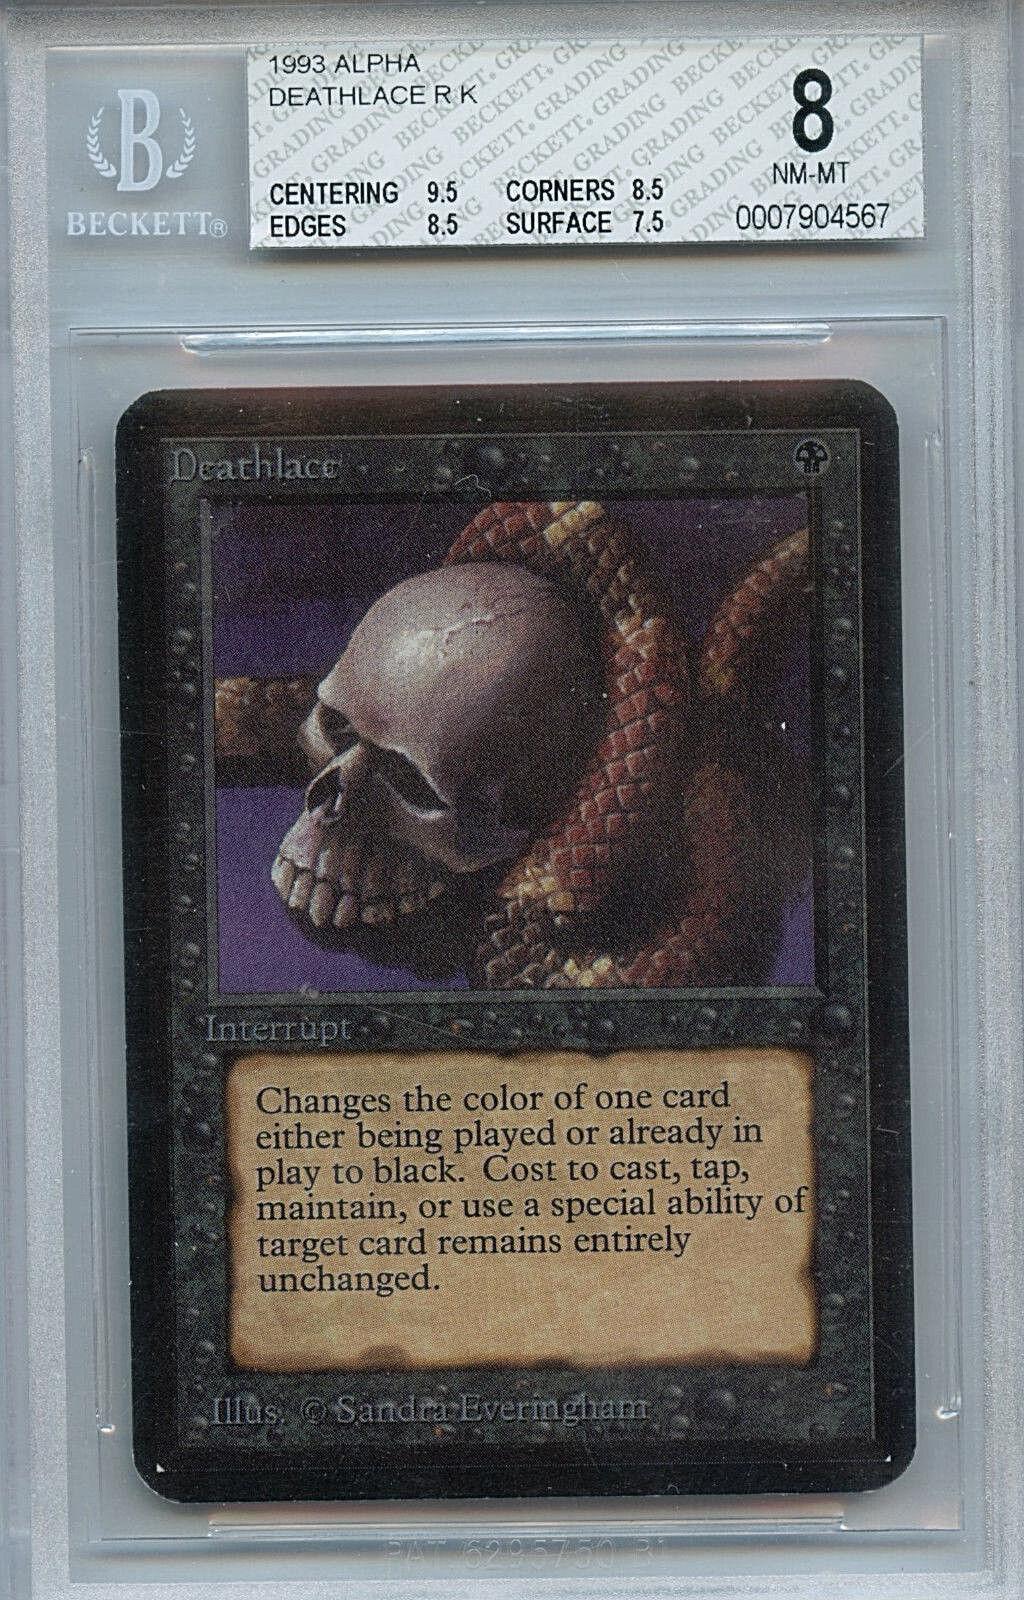 MTG Alpha Deathlace BGS 8.0 NM-MT Card Magic the Gathering WOTC 4567